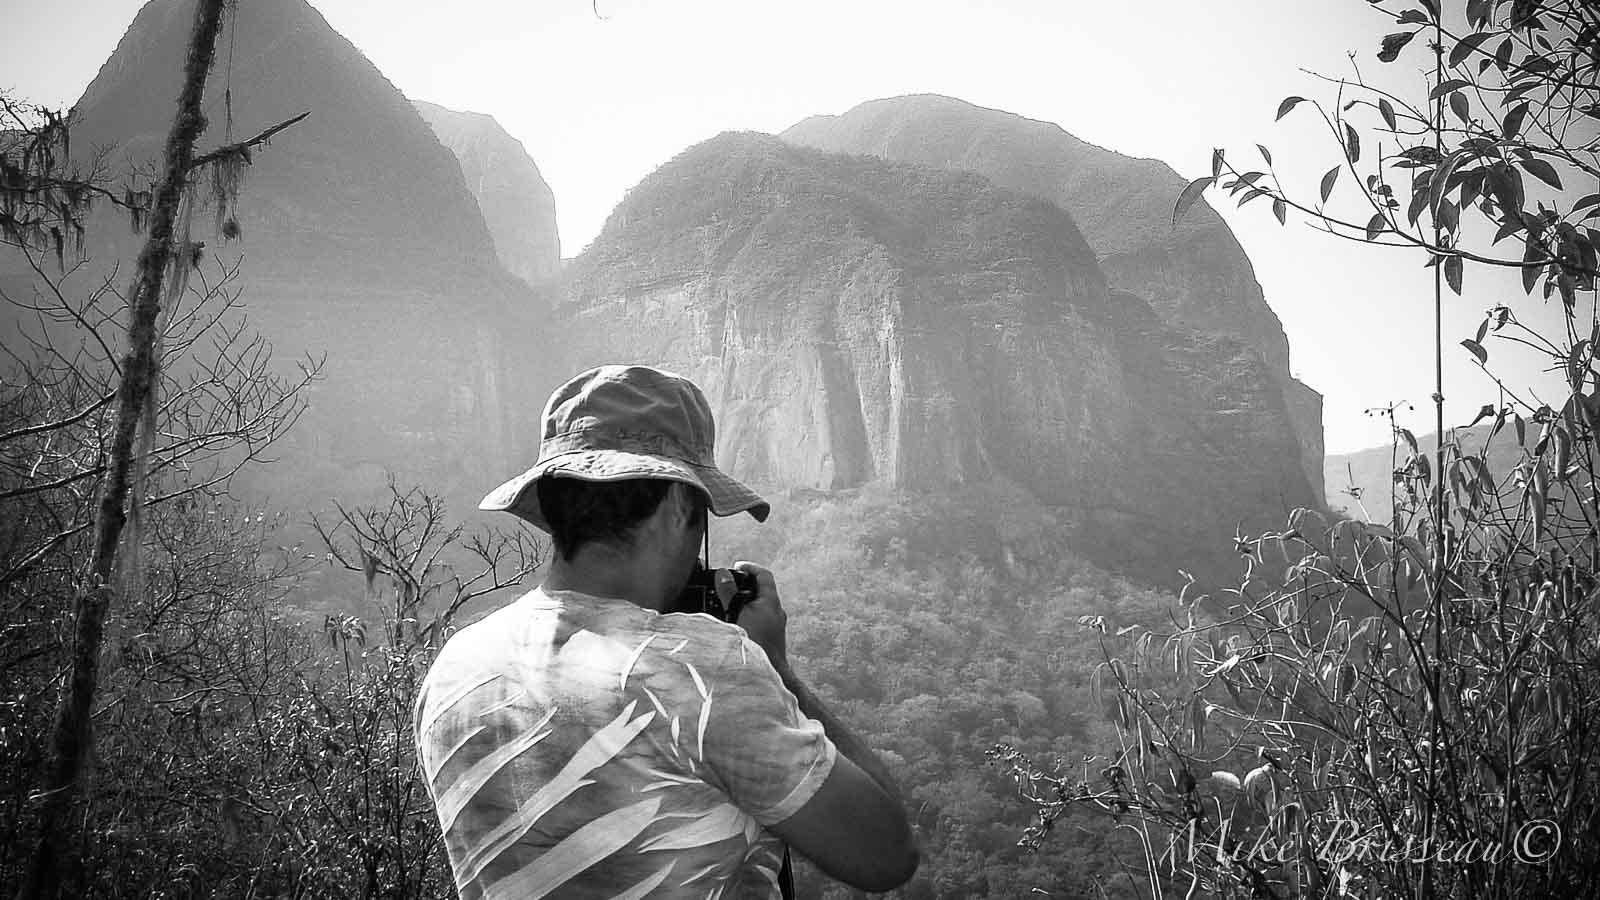 Bolivie - Amazonie - Photographe - Autoportrait